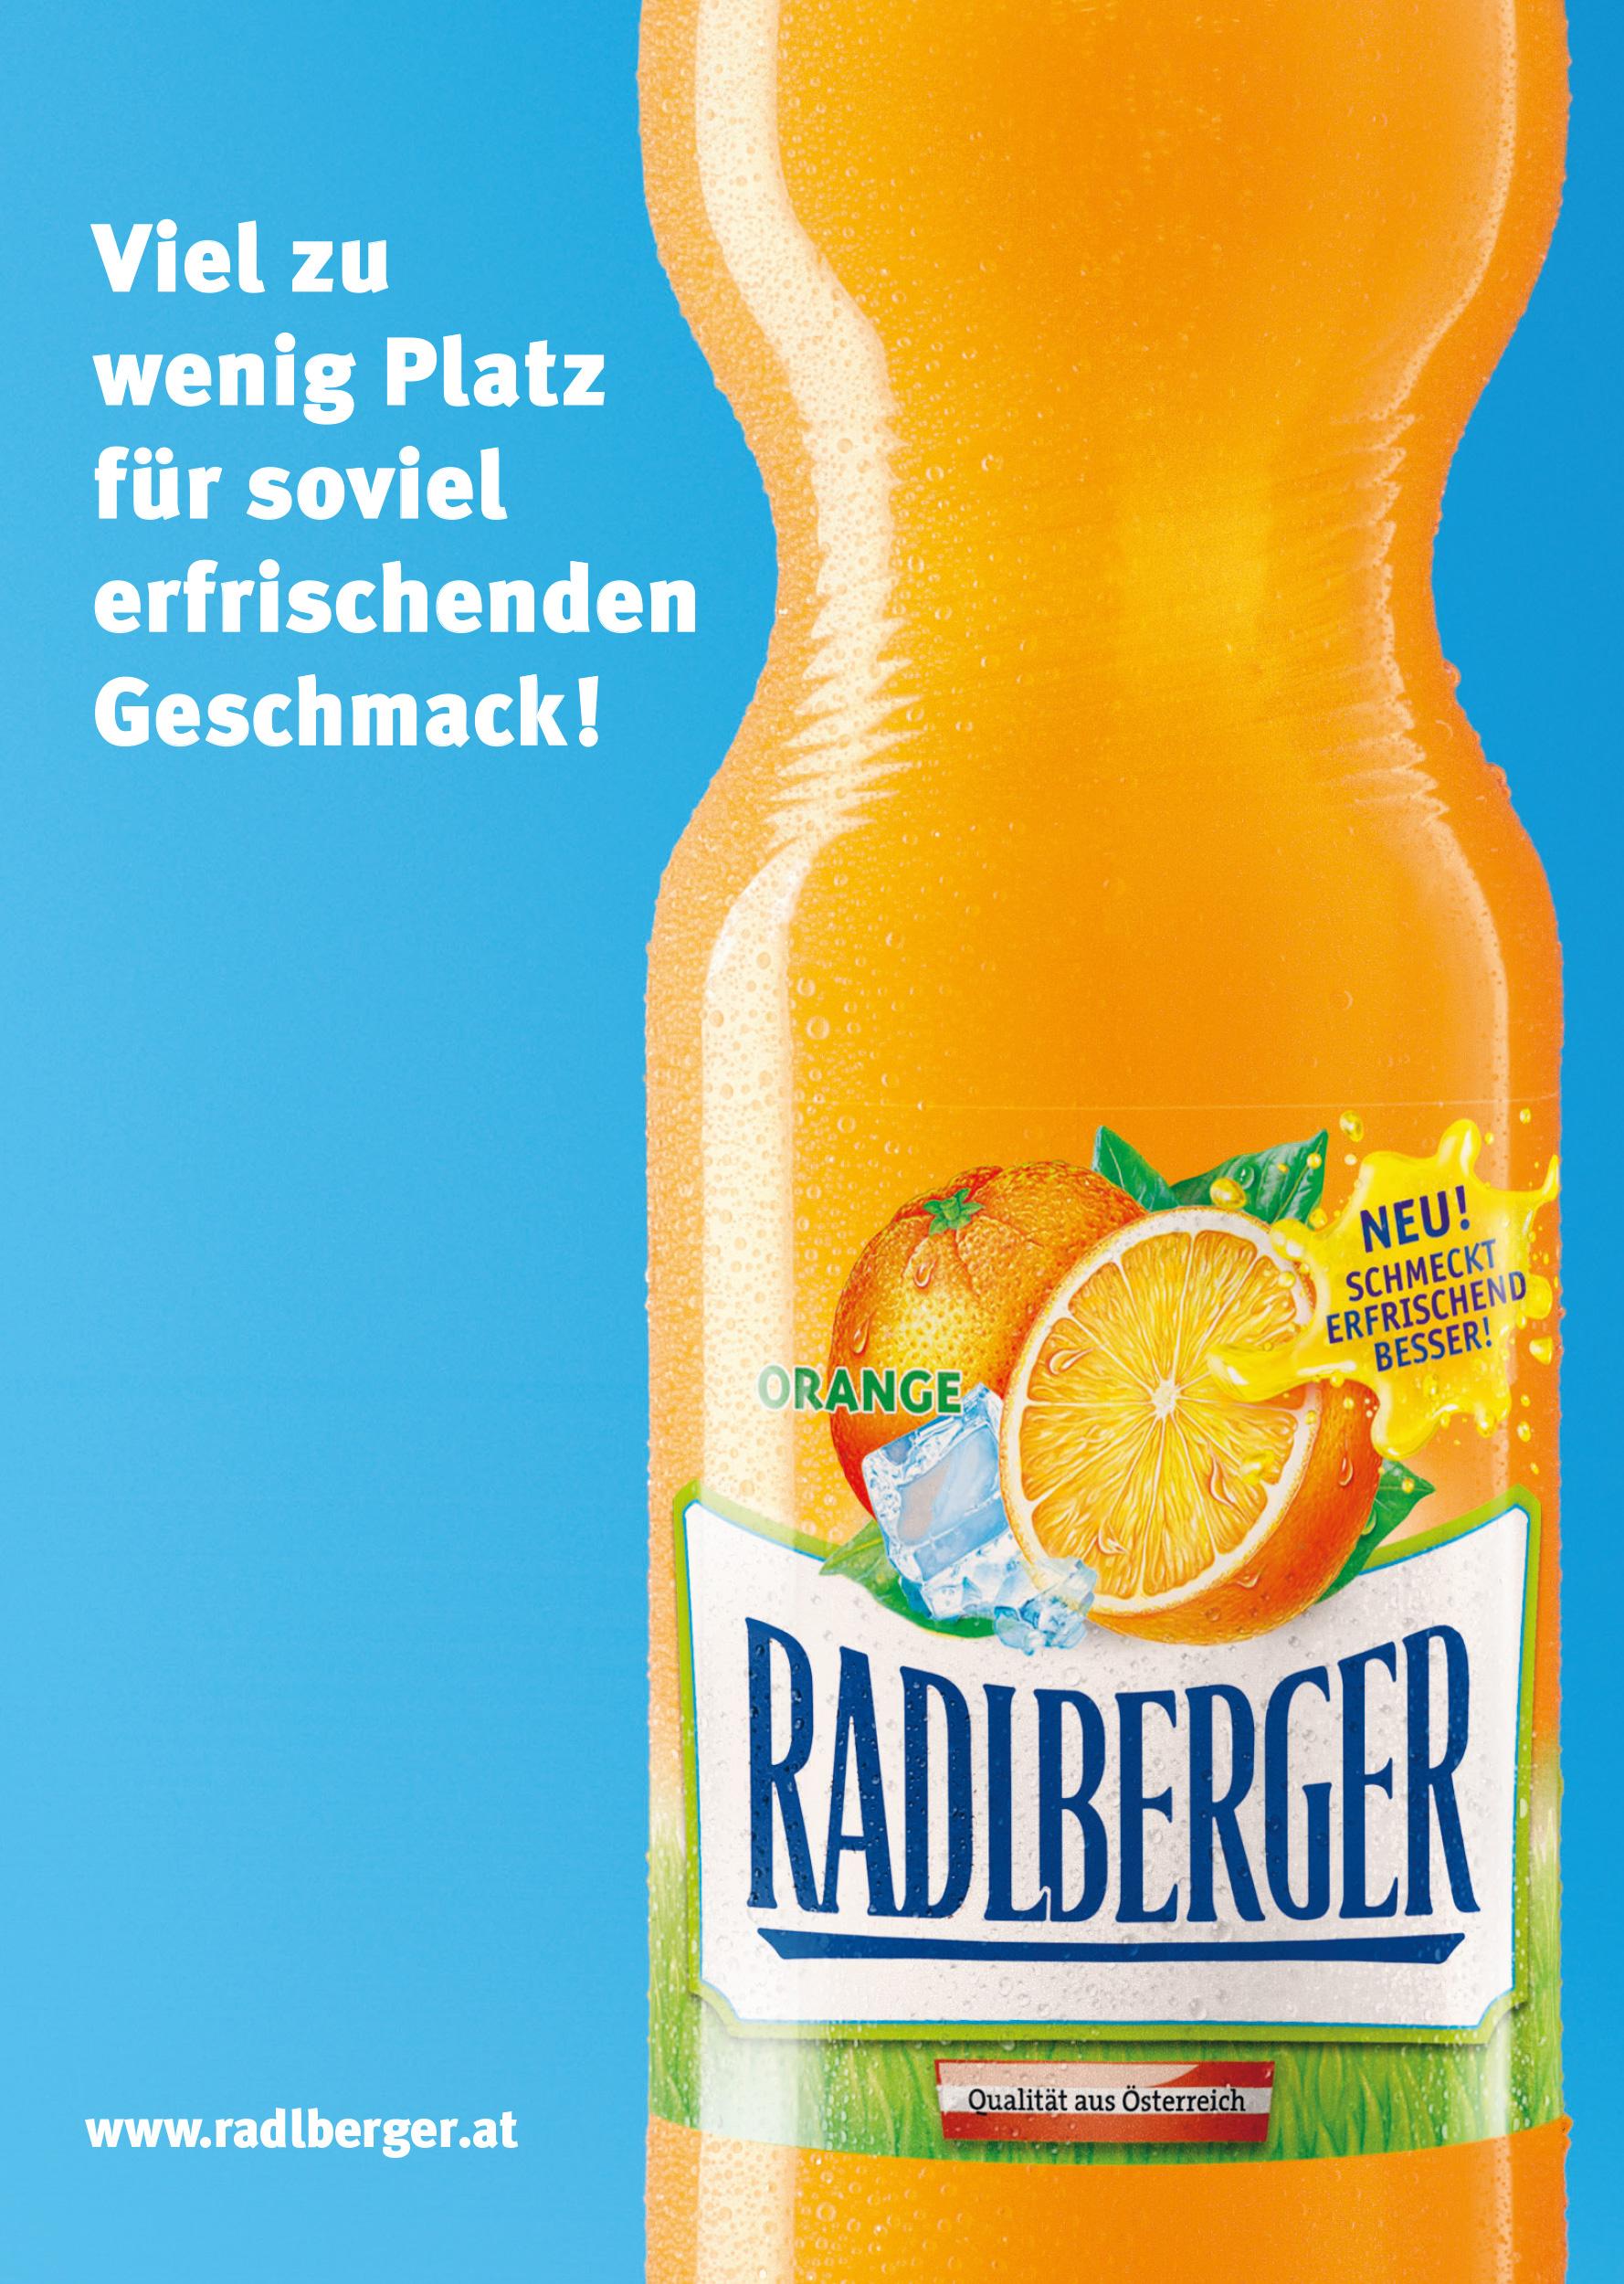 Radlberger Limonaden